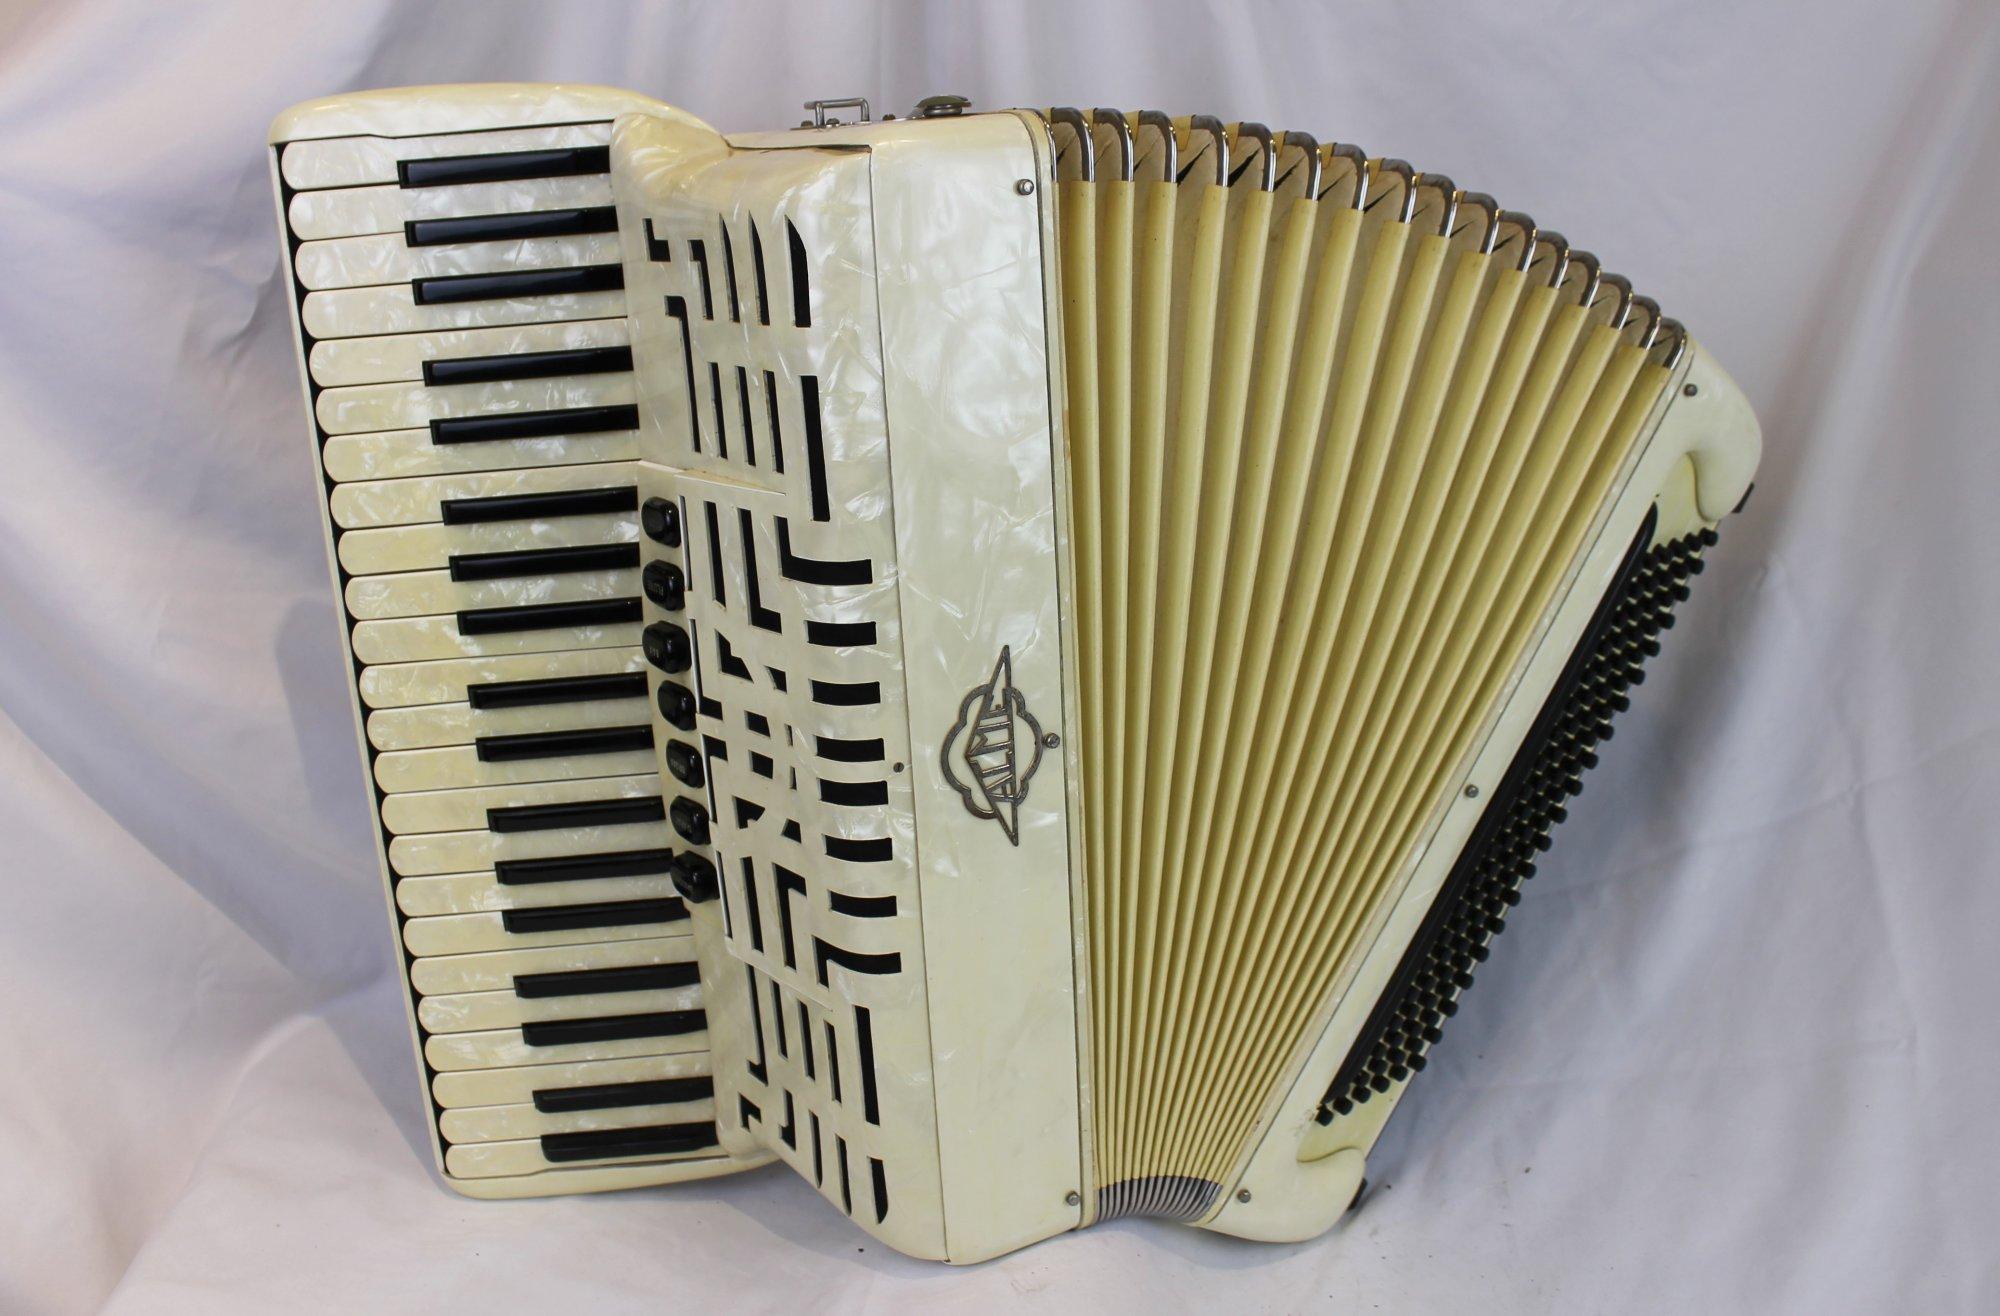 4279 - Ivory Acme Piano Accordion LMH 41 120